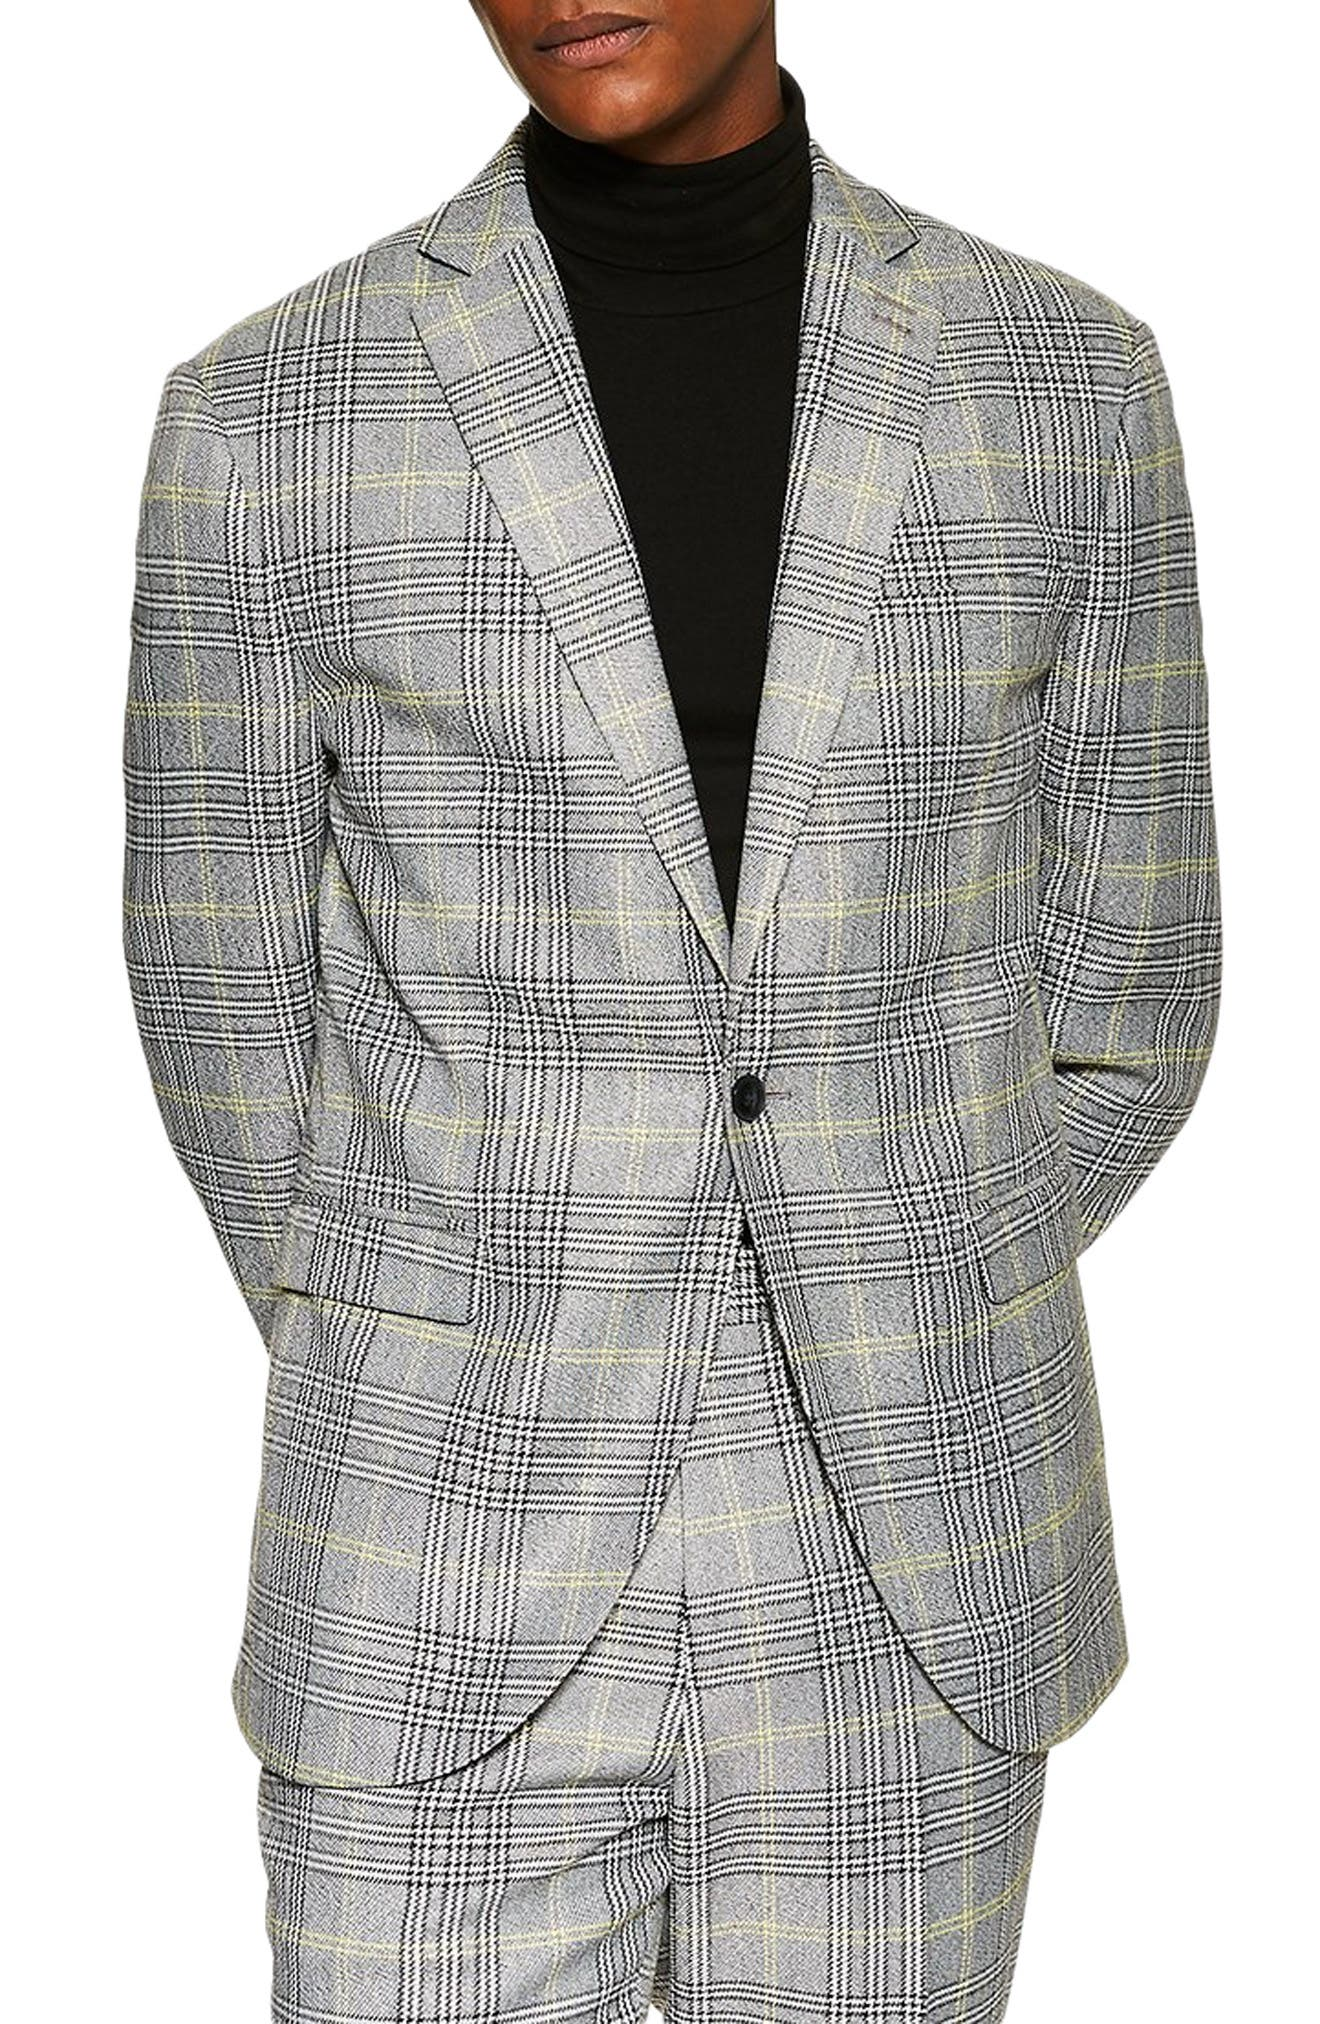 1960s Mens Suits | 70s Mens Disco Suits Mens Topman Single Breasted Check Slim Suit Jacket $144.00 AT vintagedancer.com